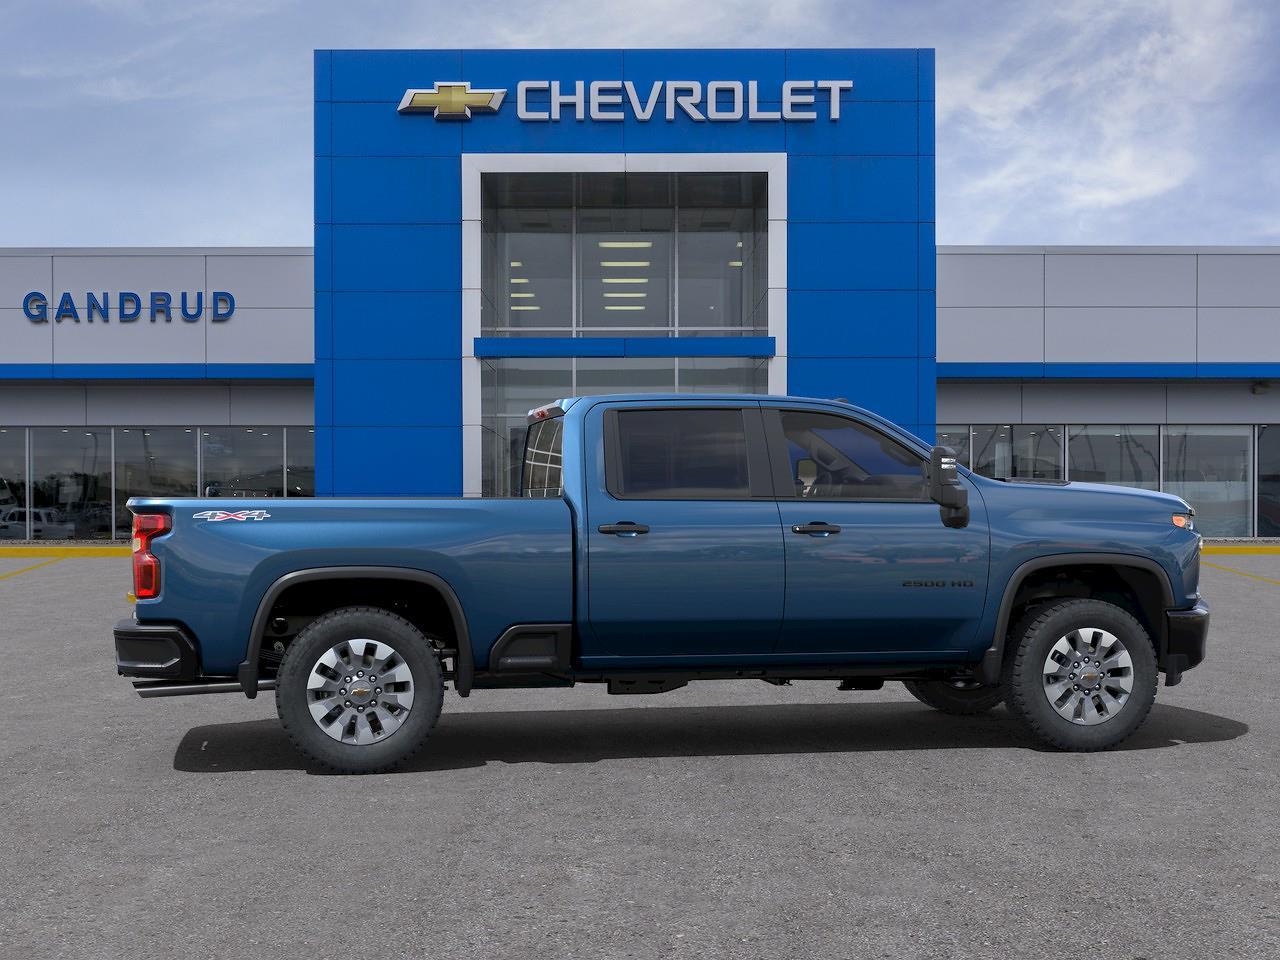 2021 Chevrolet Silverado 2500 Crew Cab 4x4, Pickup #M1388 - photo 5